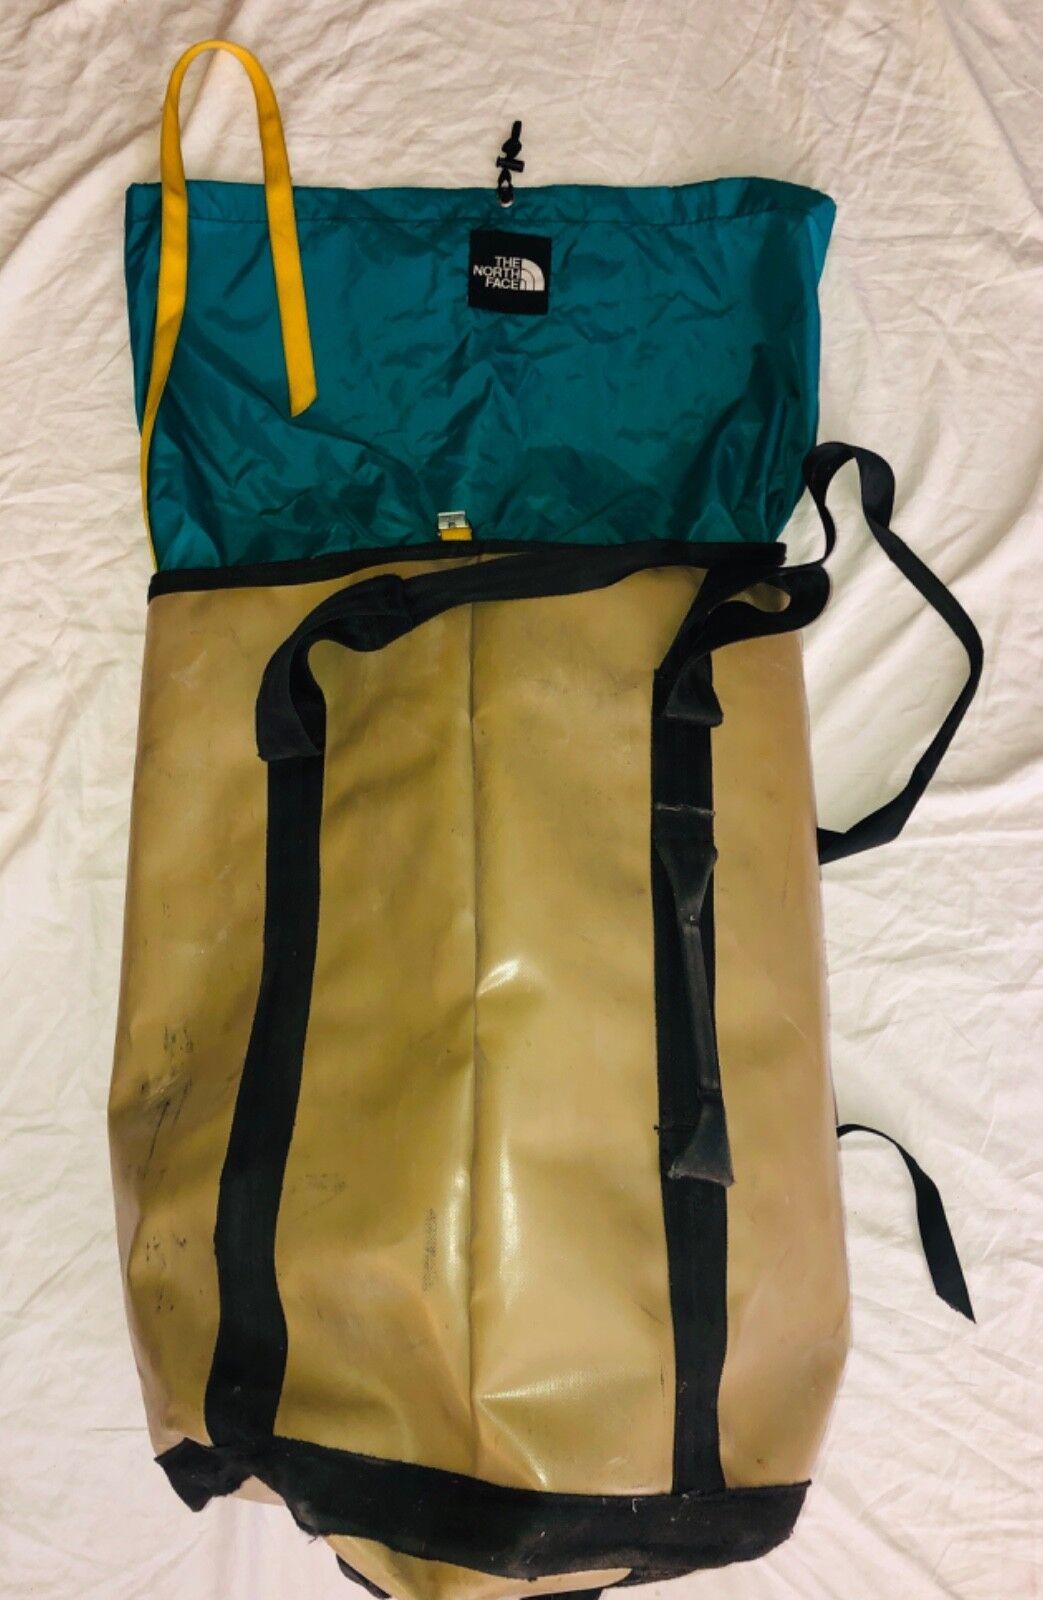 North Face A5 Radix Haul Bag, 7500 cu inches, Waterproof, VTG  USA